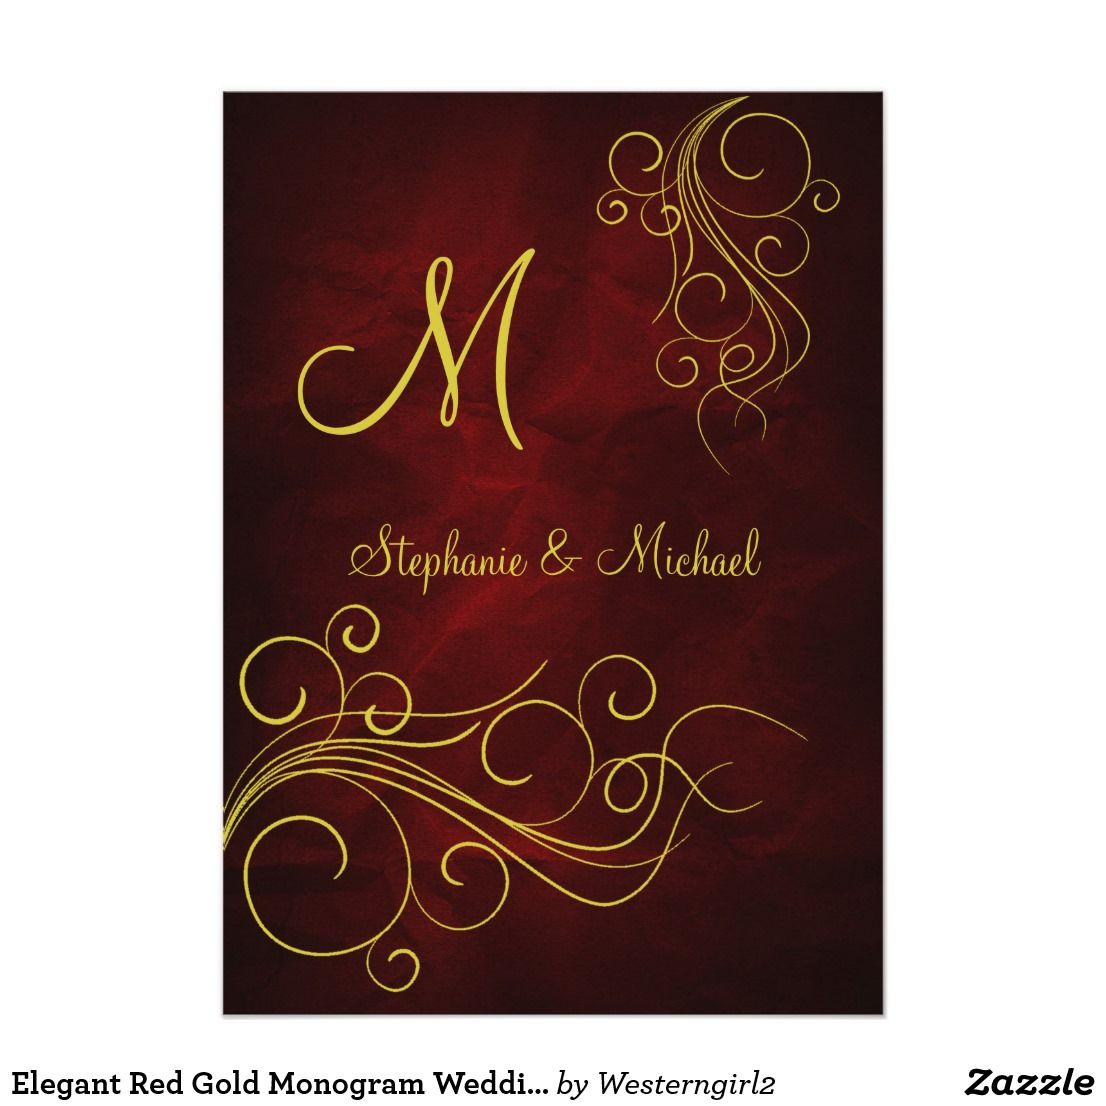 Elegant Red Gold Monogram Wedding Invitation | Elegant, Elegant ...